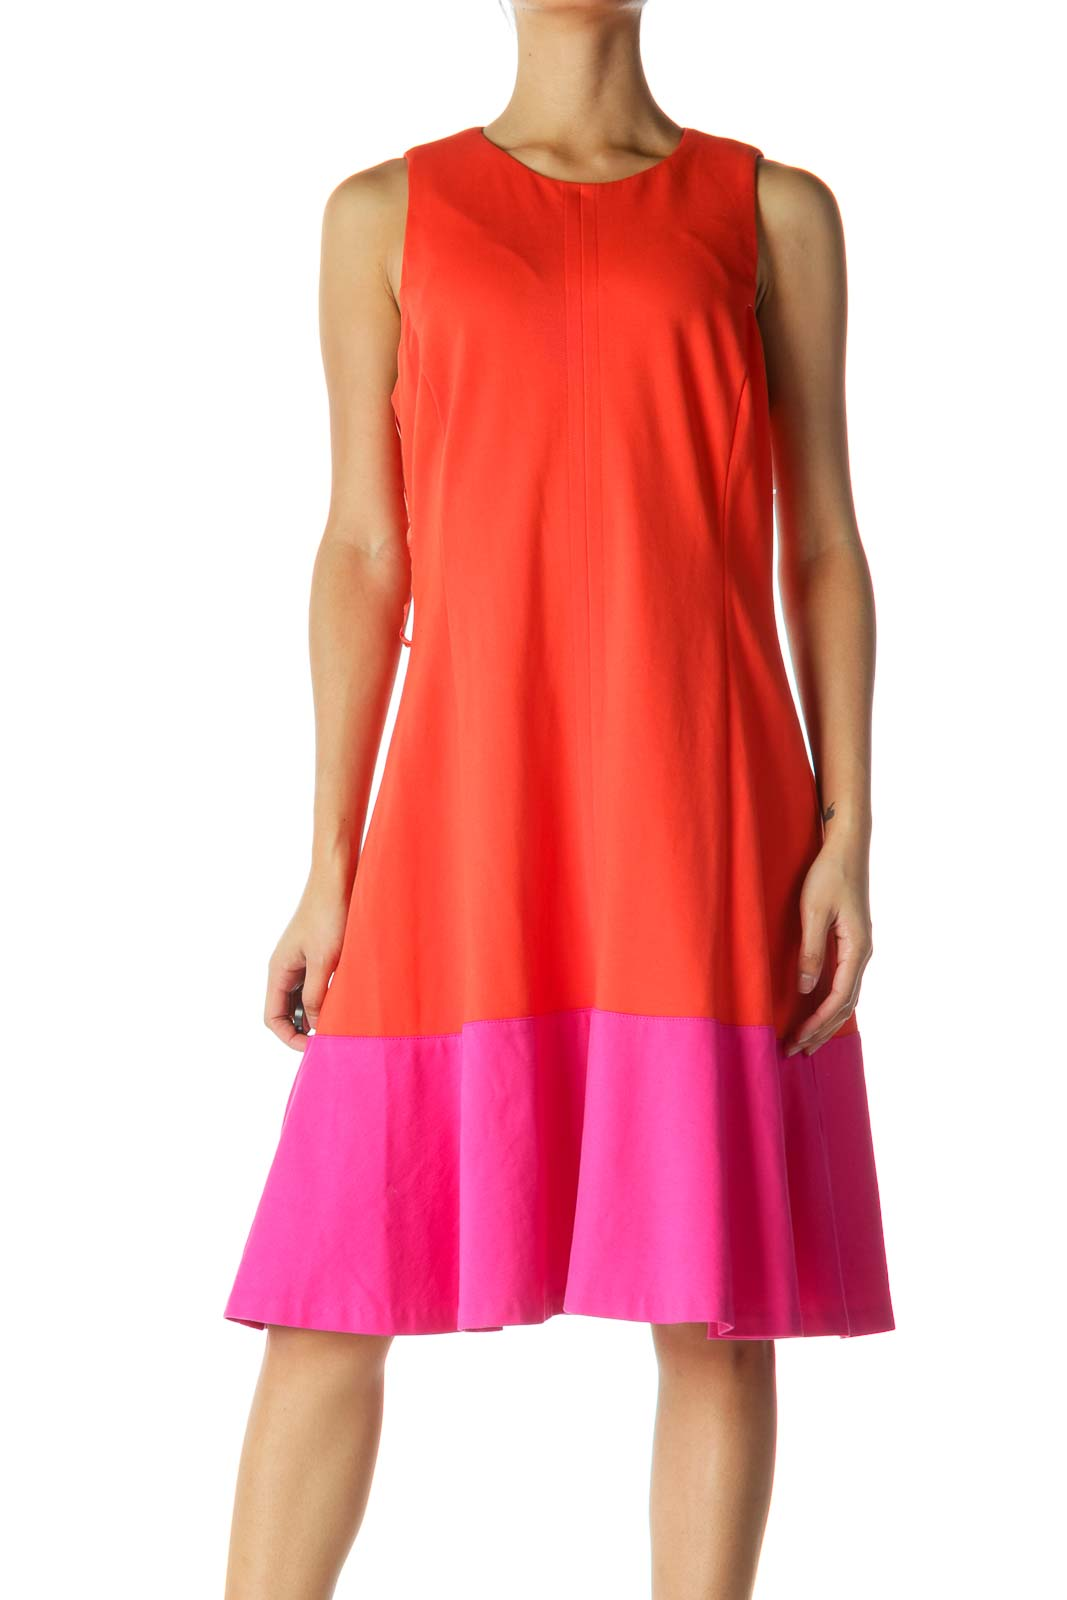 Orange and Pink Color Block Shift Dress Front